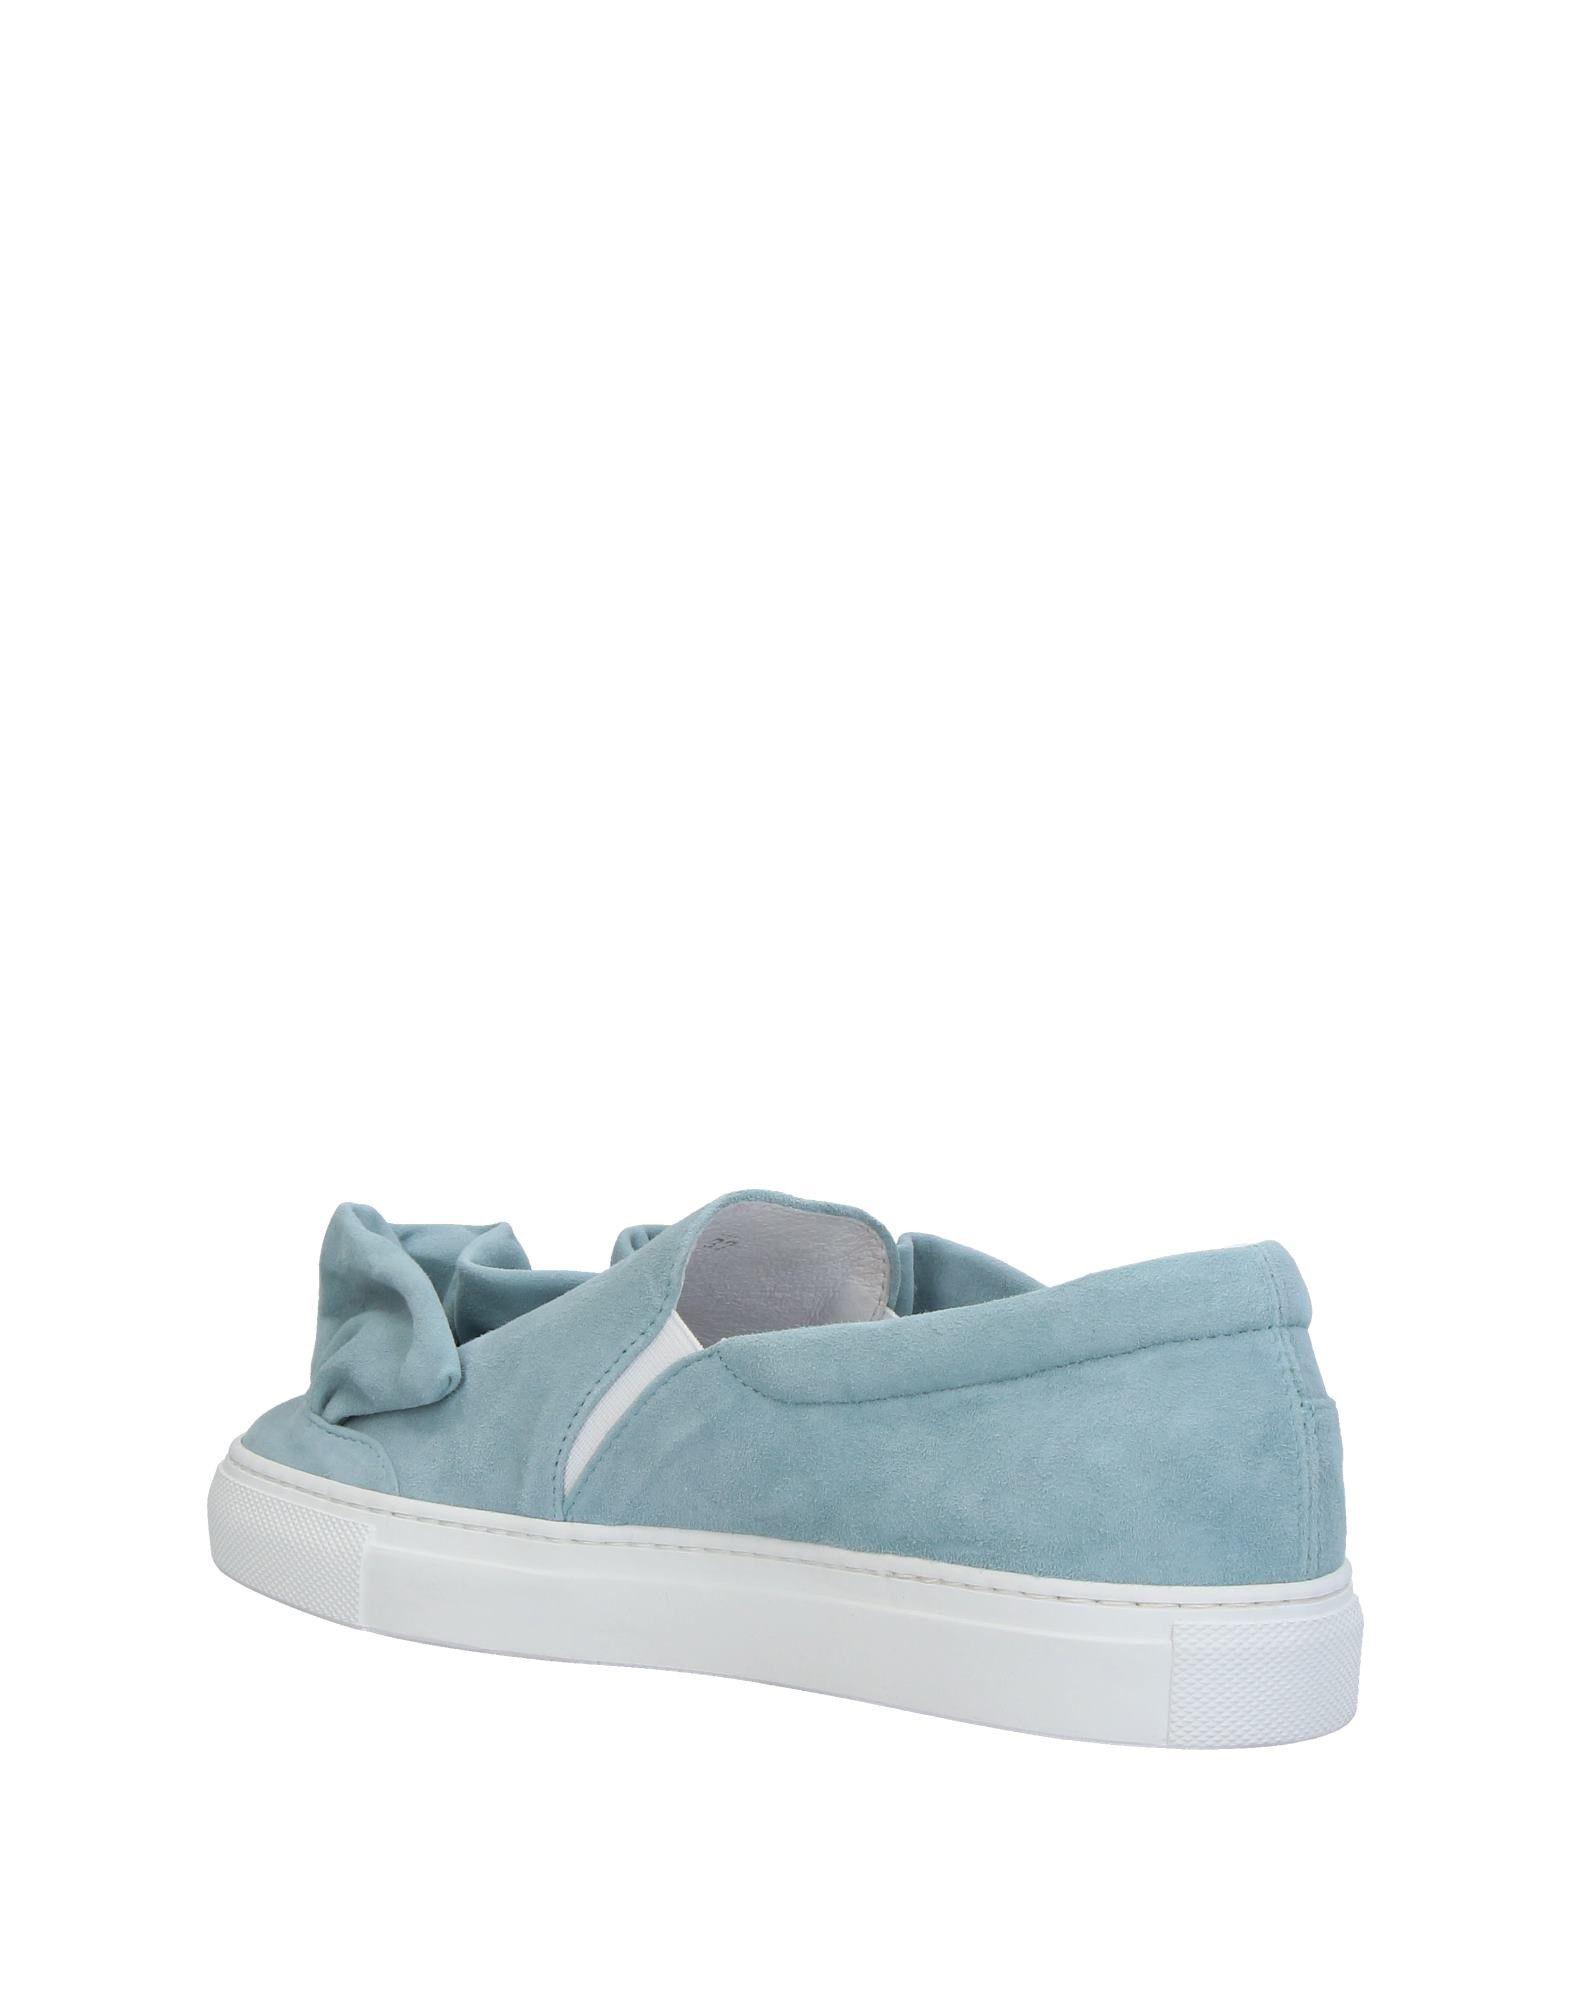 Via Vela 14 Sneakers Damen Damen Damen  11386391MG Neue Schuhe db5cd5